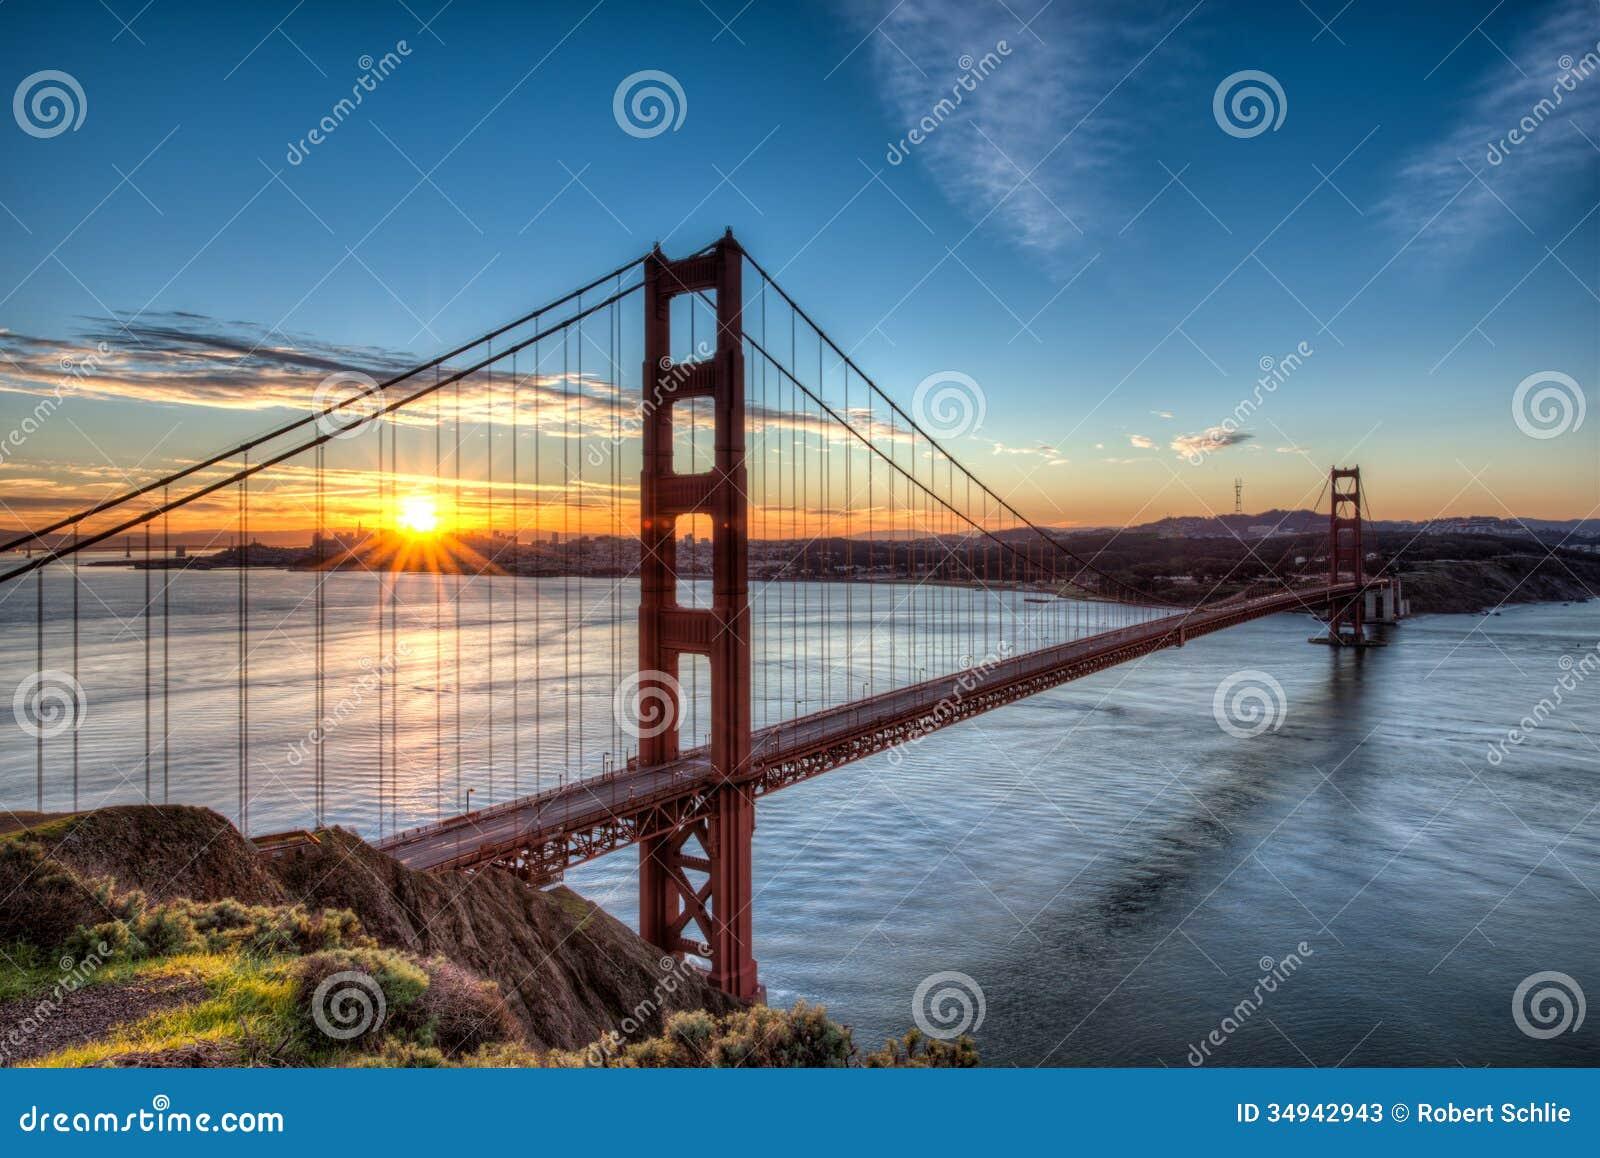 Golden Gate Bridge at Sunrise